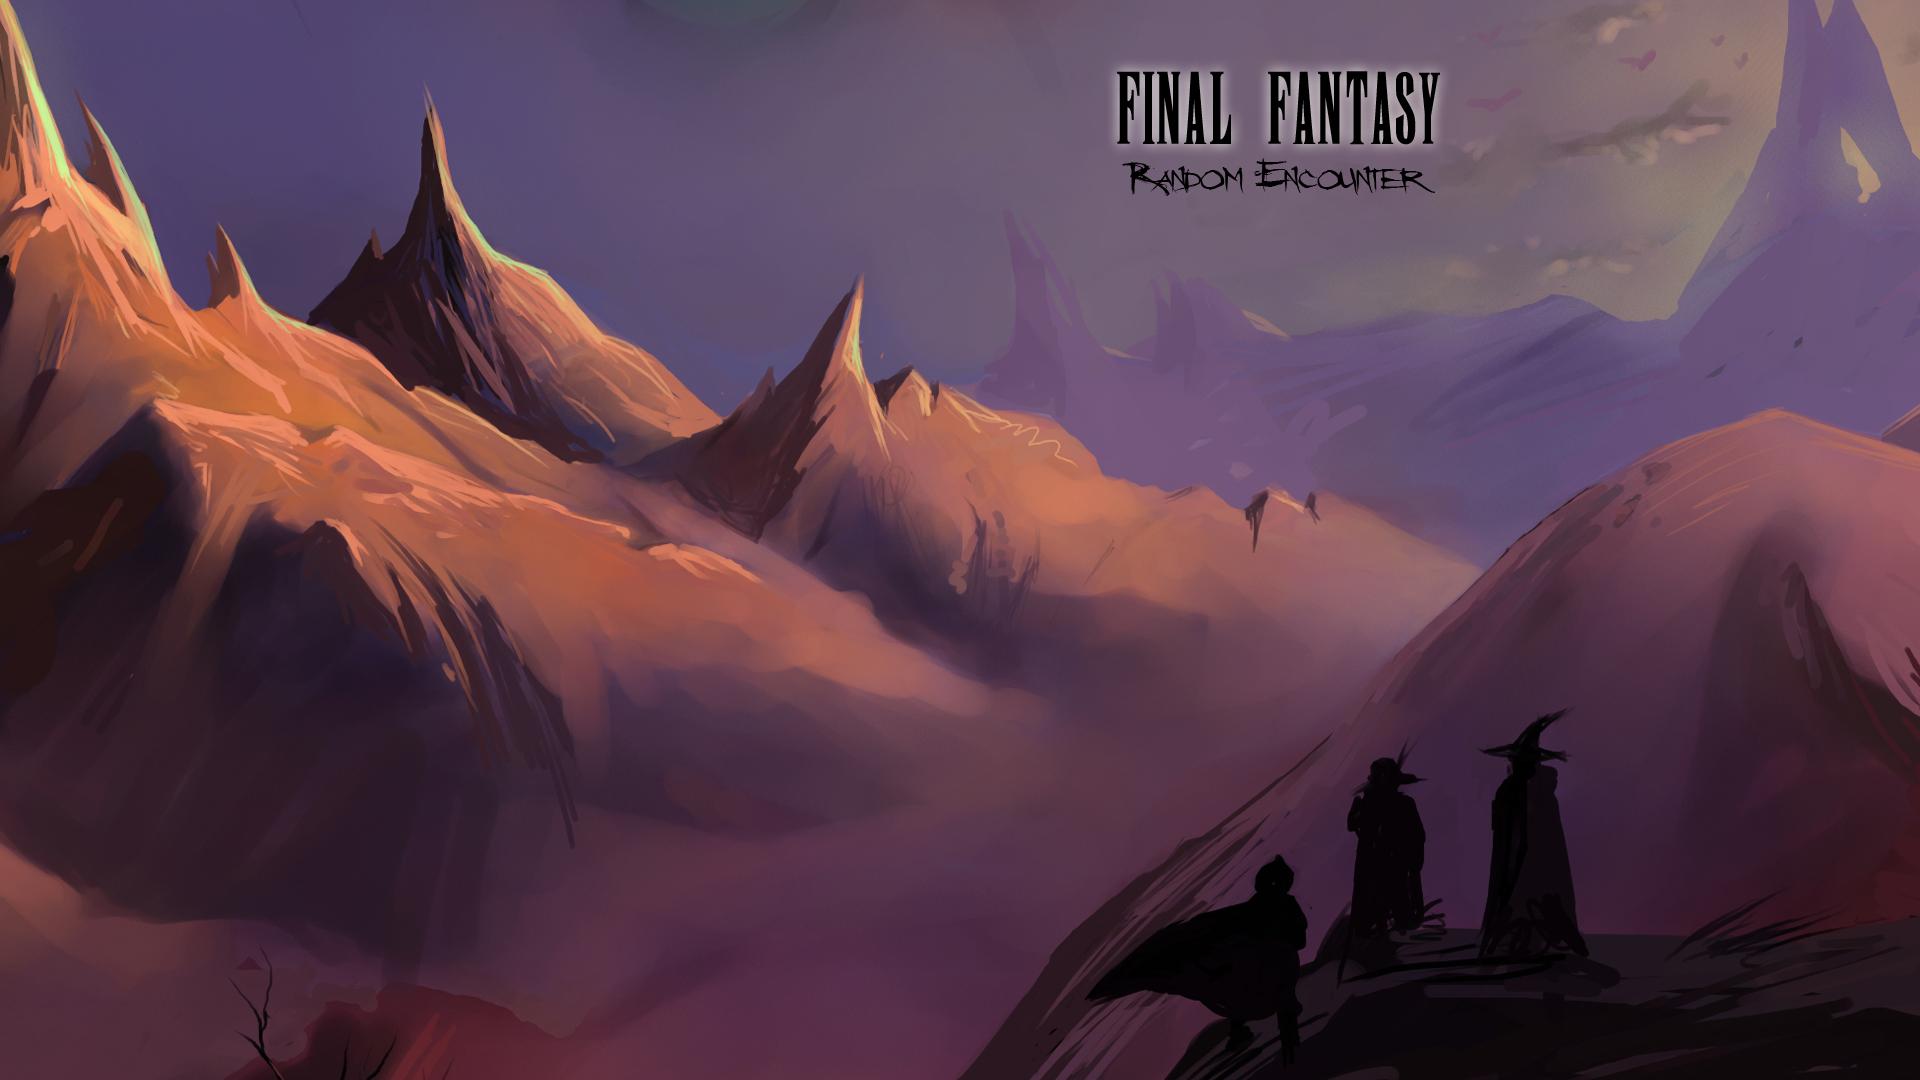 48 final fantasy 9 wallpaper on wallpapersafari - Ffviii wallpaper ...